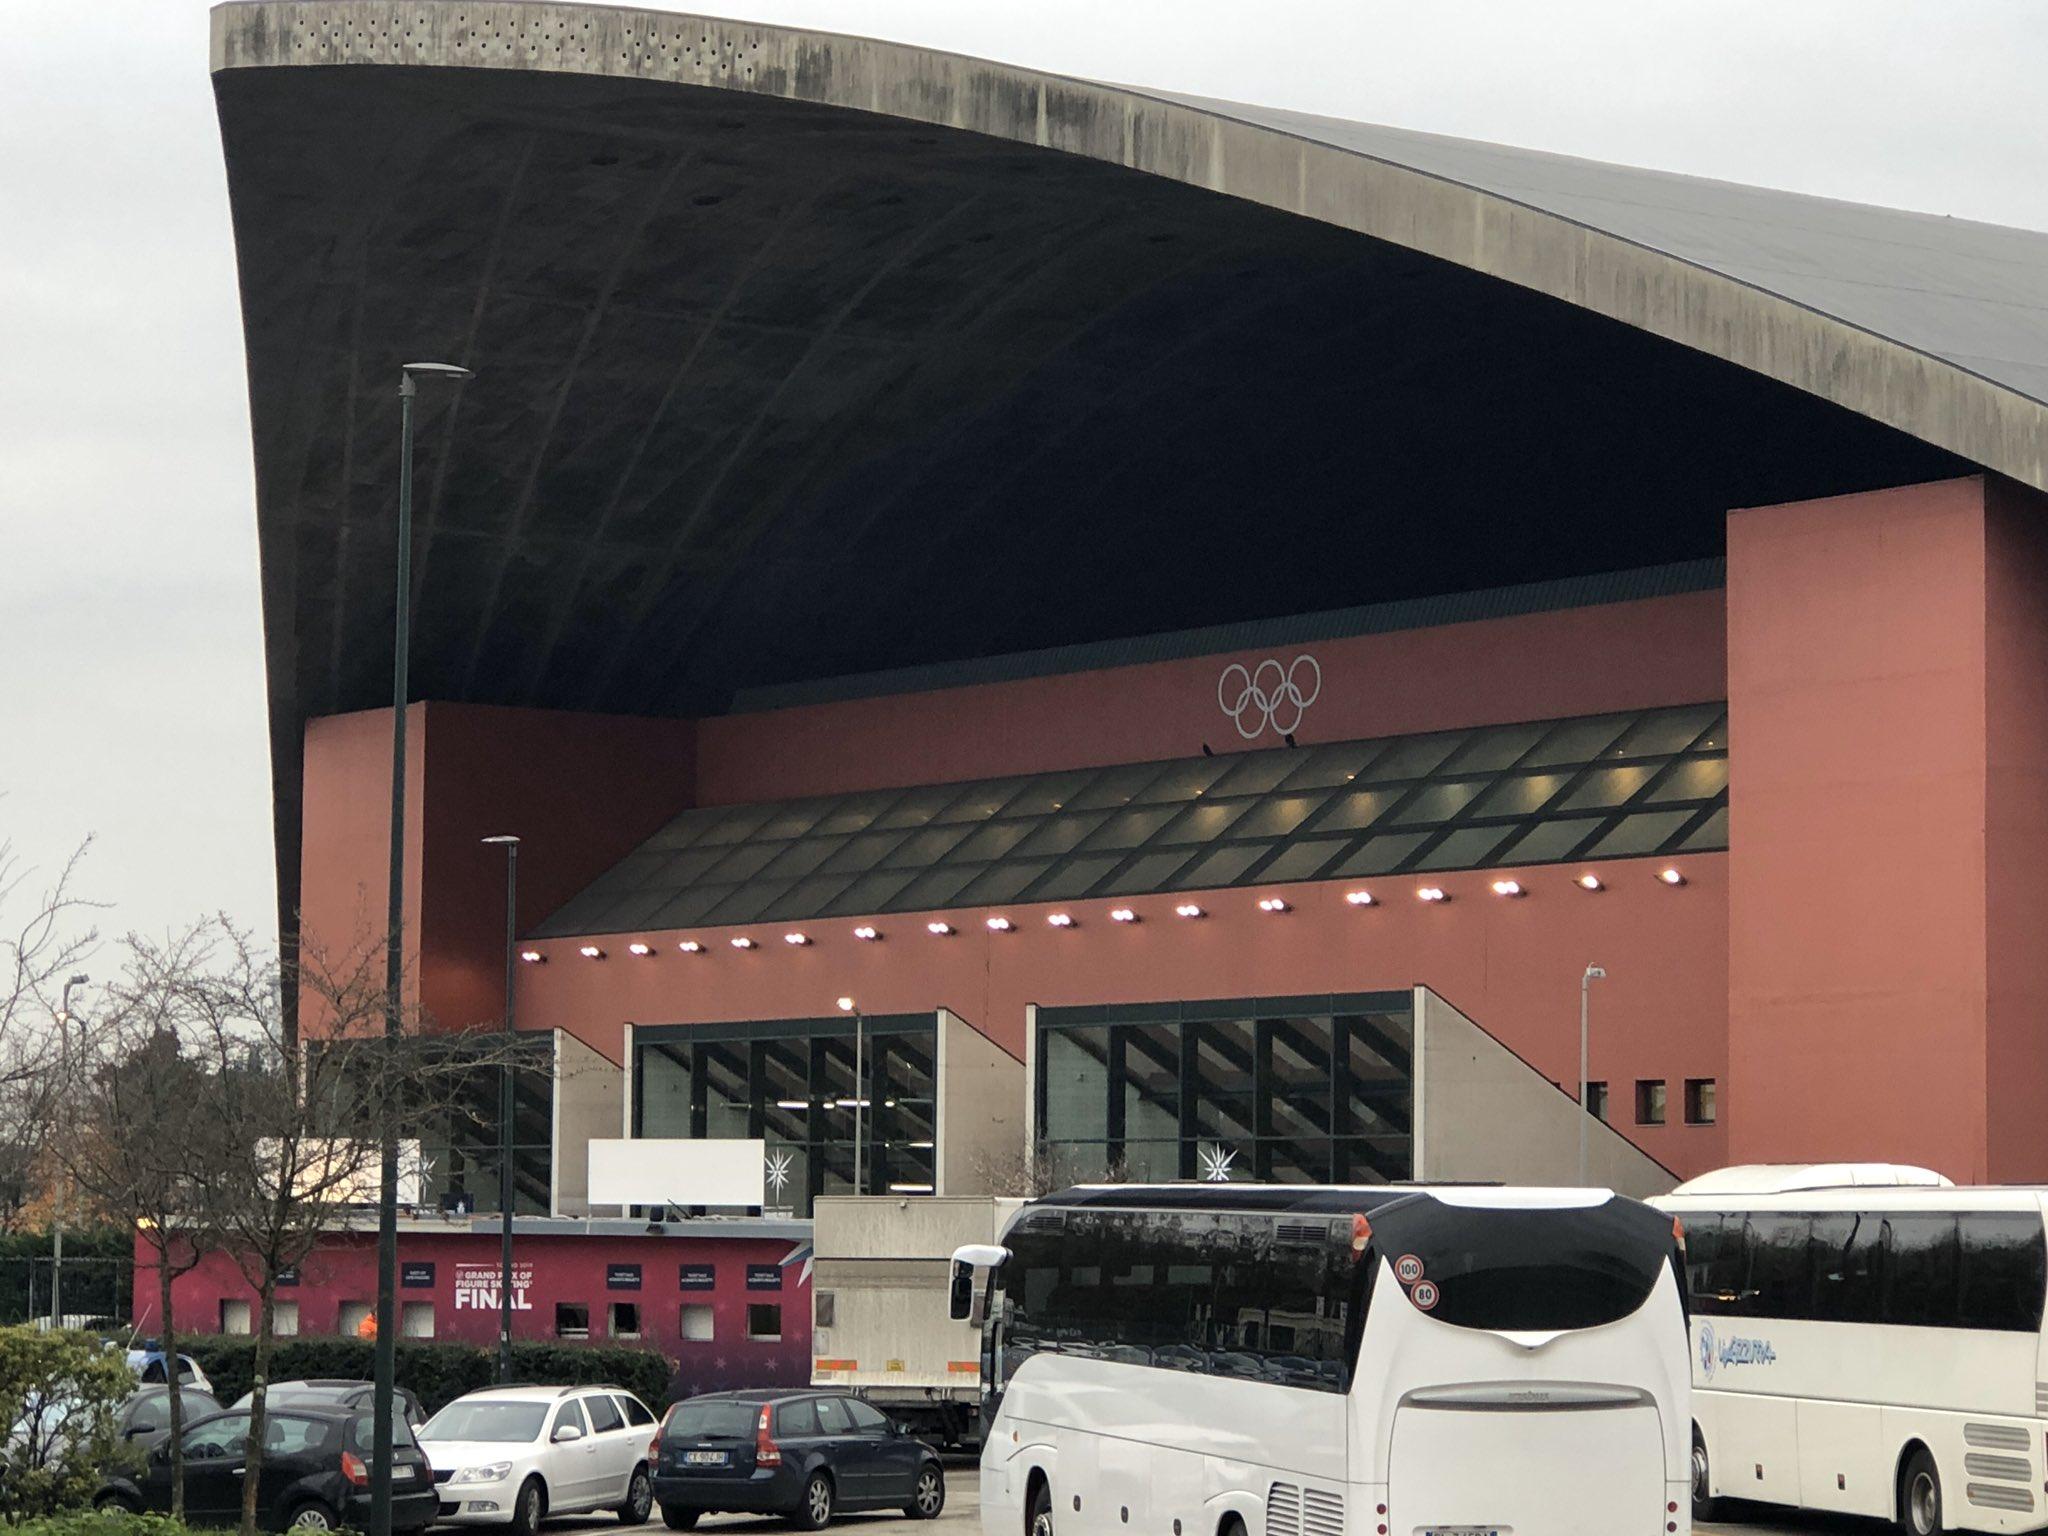 ISU Grand Prix of Figure Skating Final (Senior & Junior). Dec 05 - Dec 08, 2019.  Torino /ITA  - Страница 3 EK7fac1XkAAo7o4?format=jpg&name=4096x4096